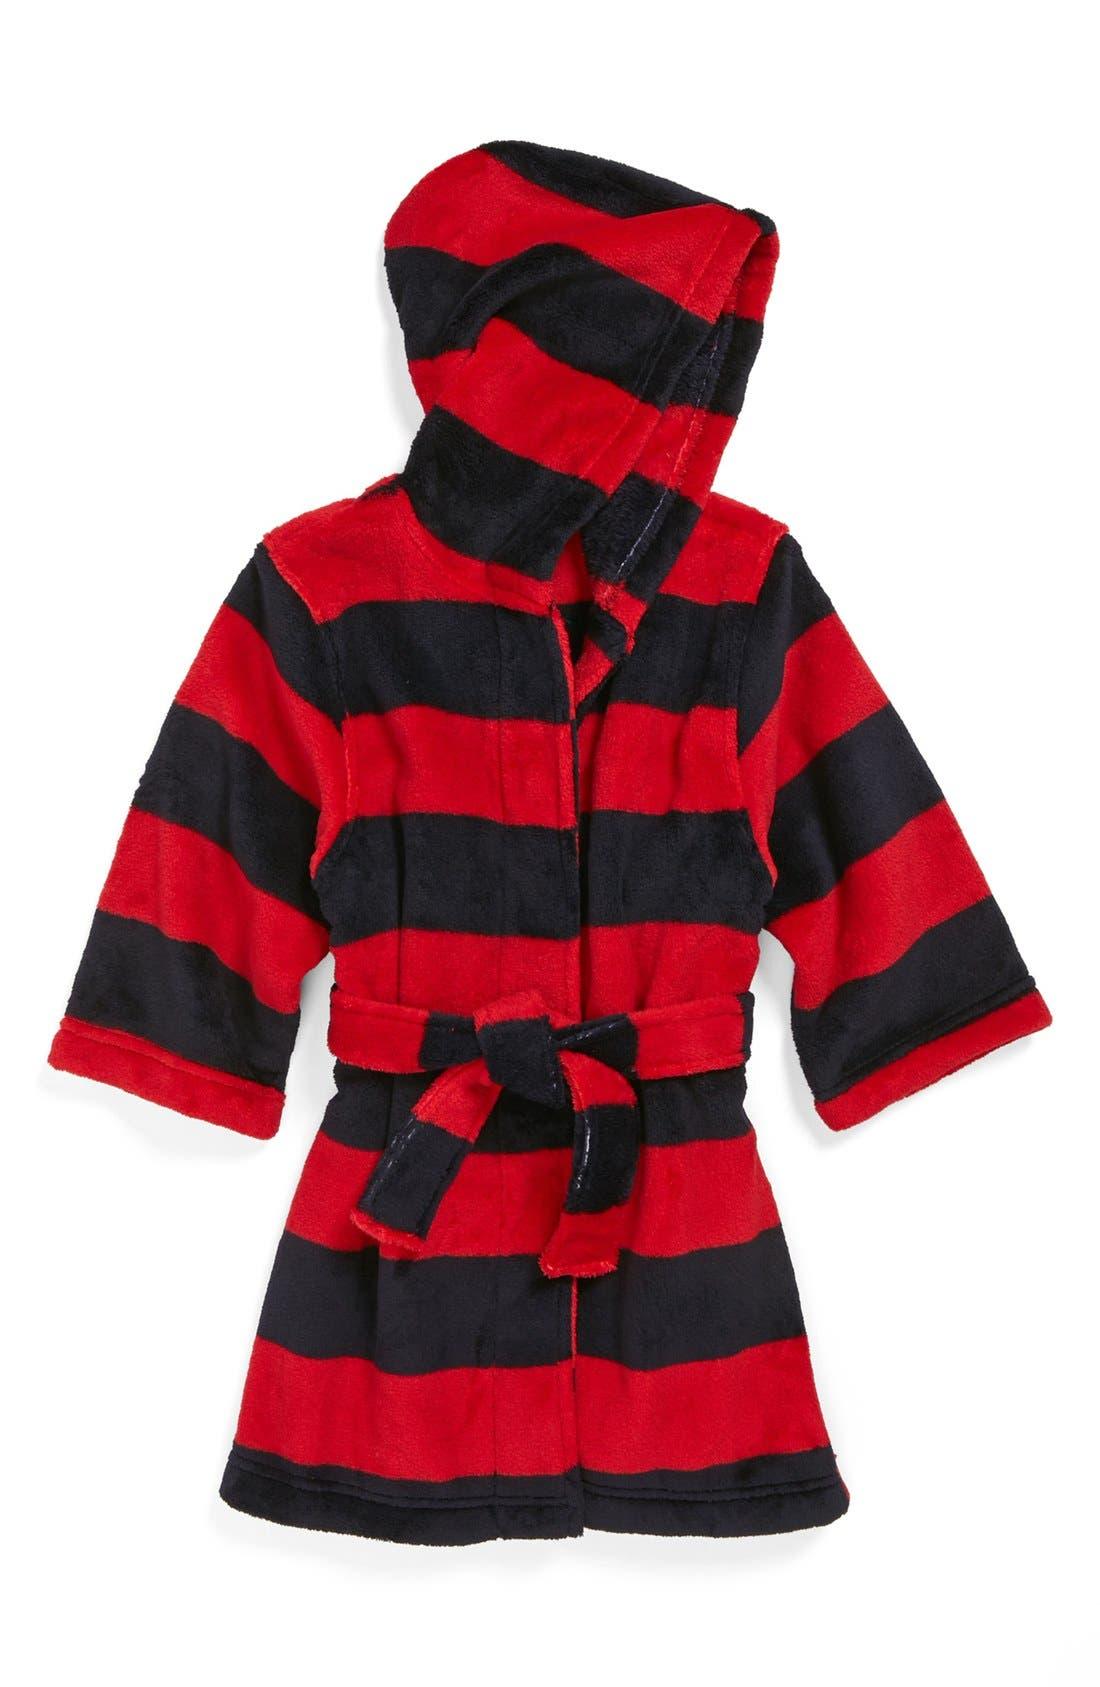 Main Image - Tucker + Tate Hooded Robe (Toddler Boys)